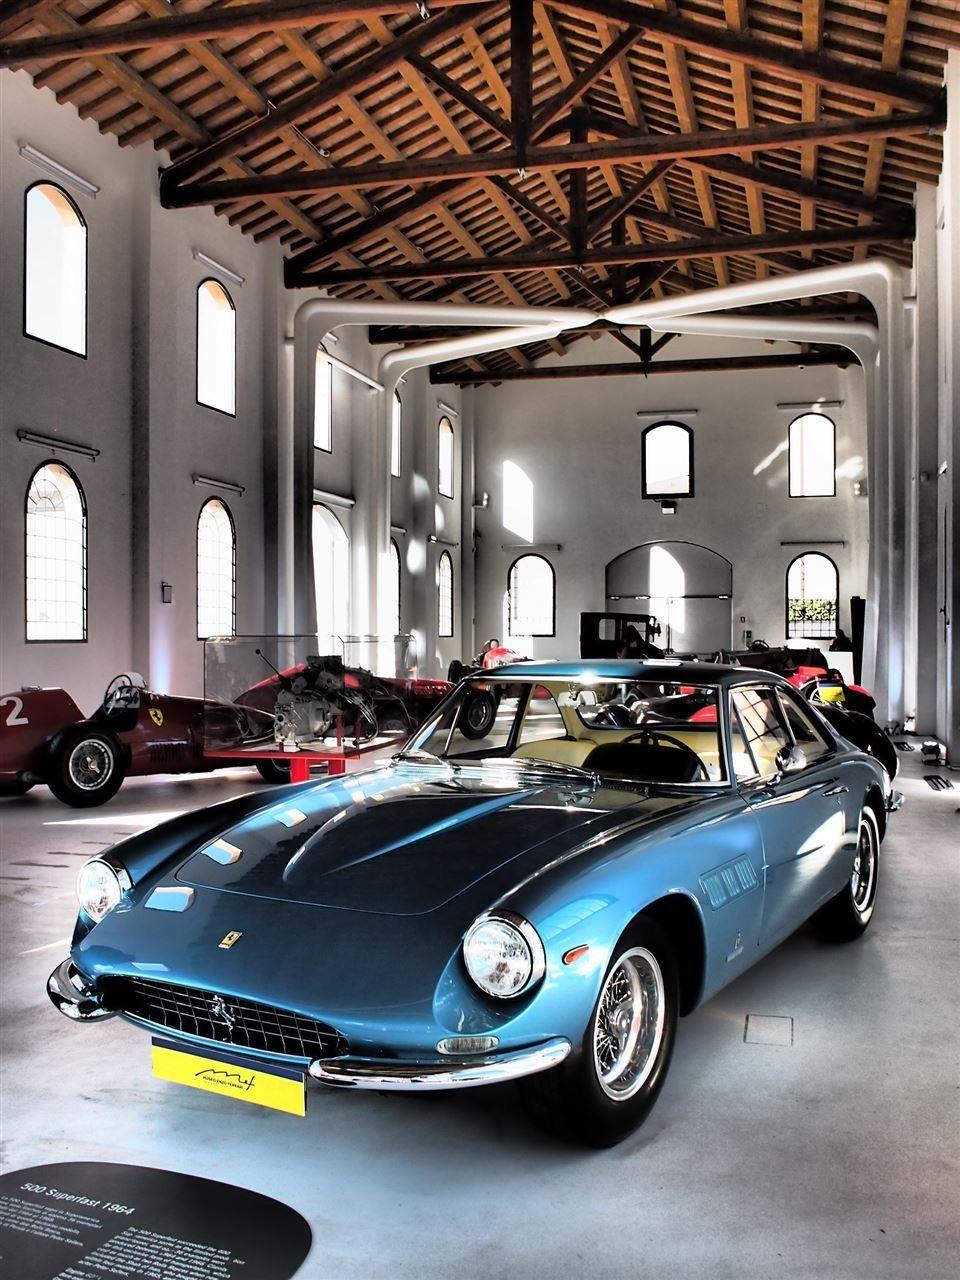 Ferrari 500 Super Fast Ferrari Vintage Classic Car Garage Classic Cars